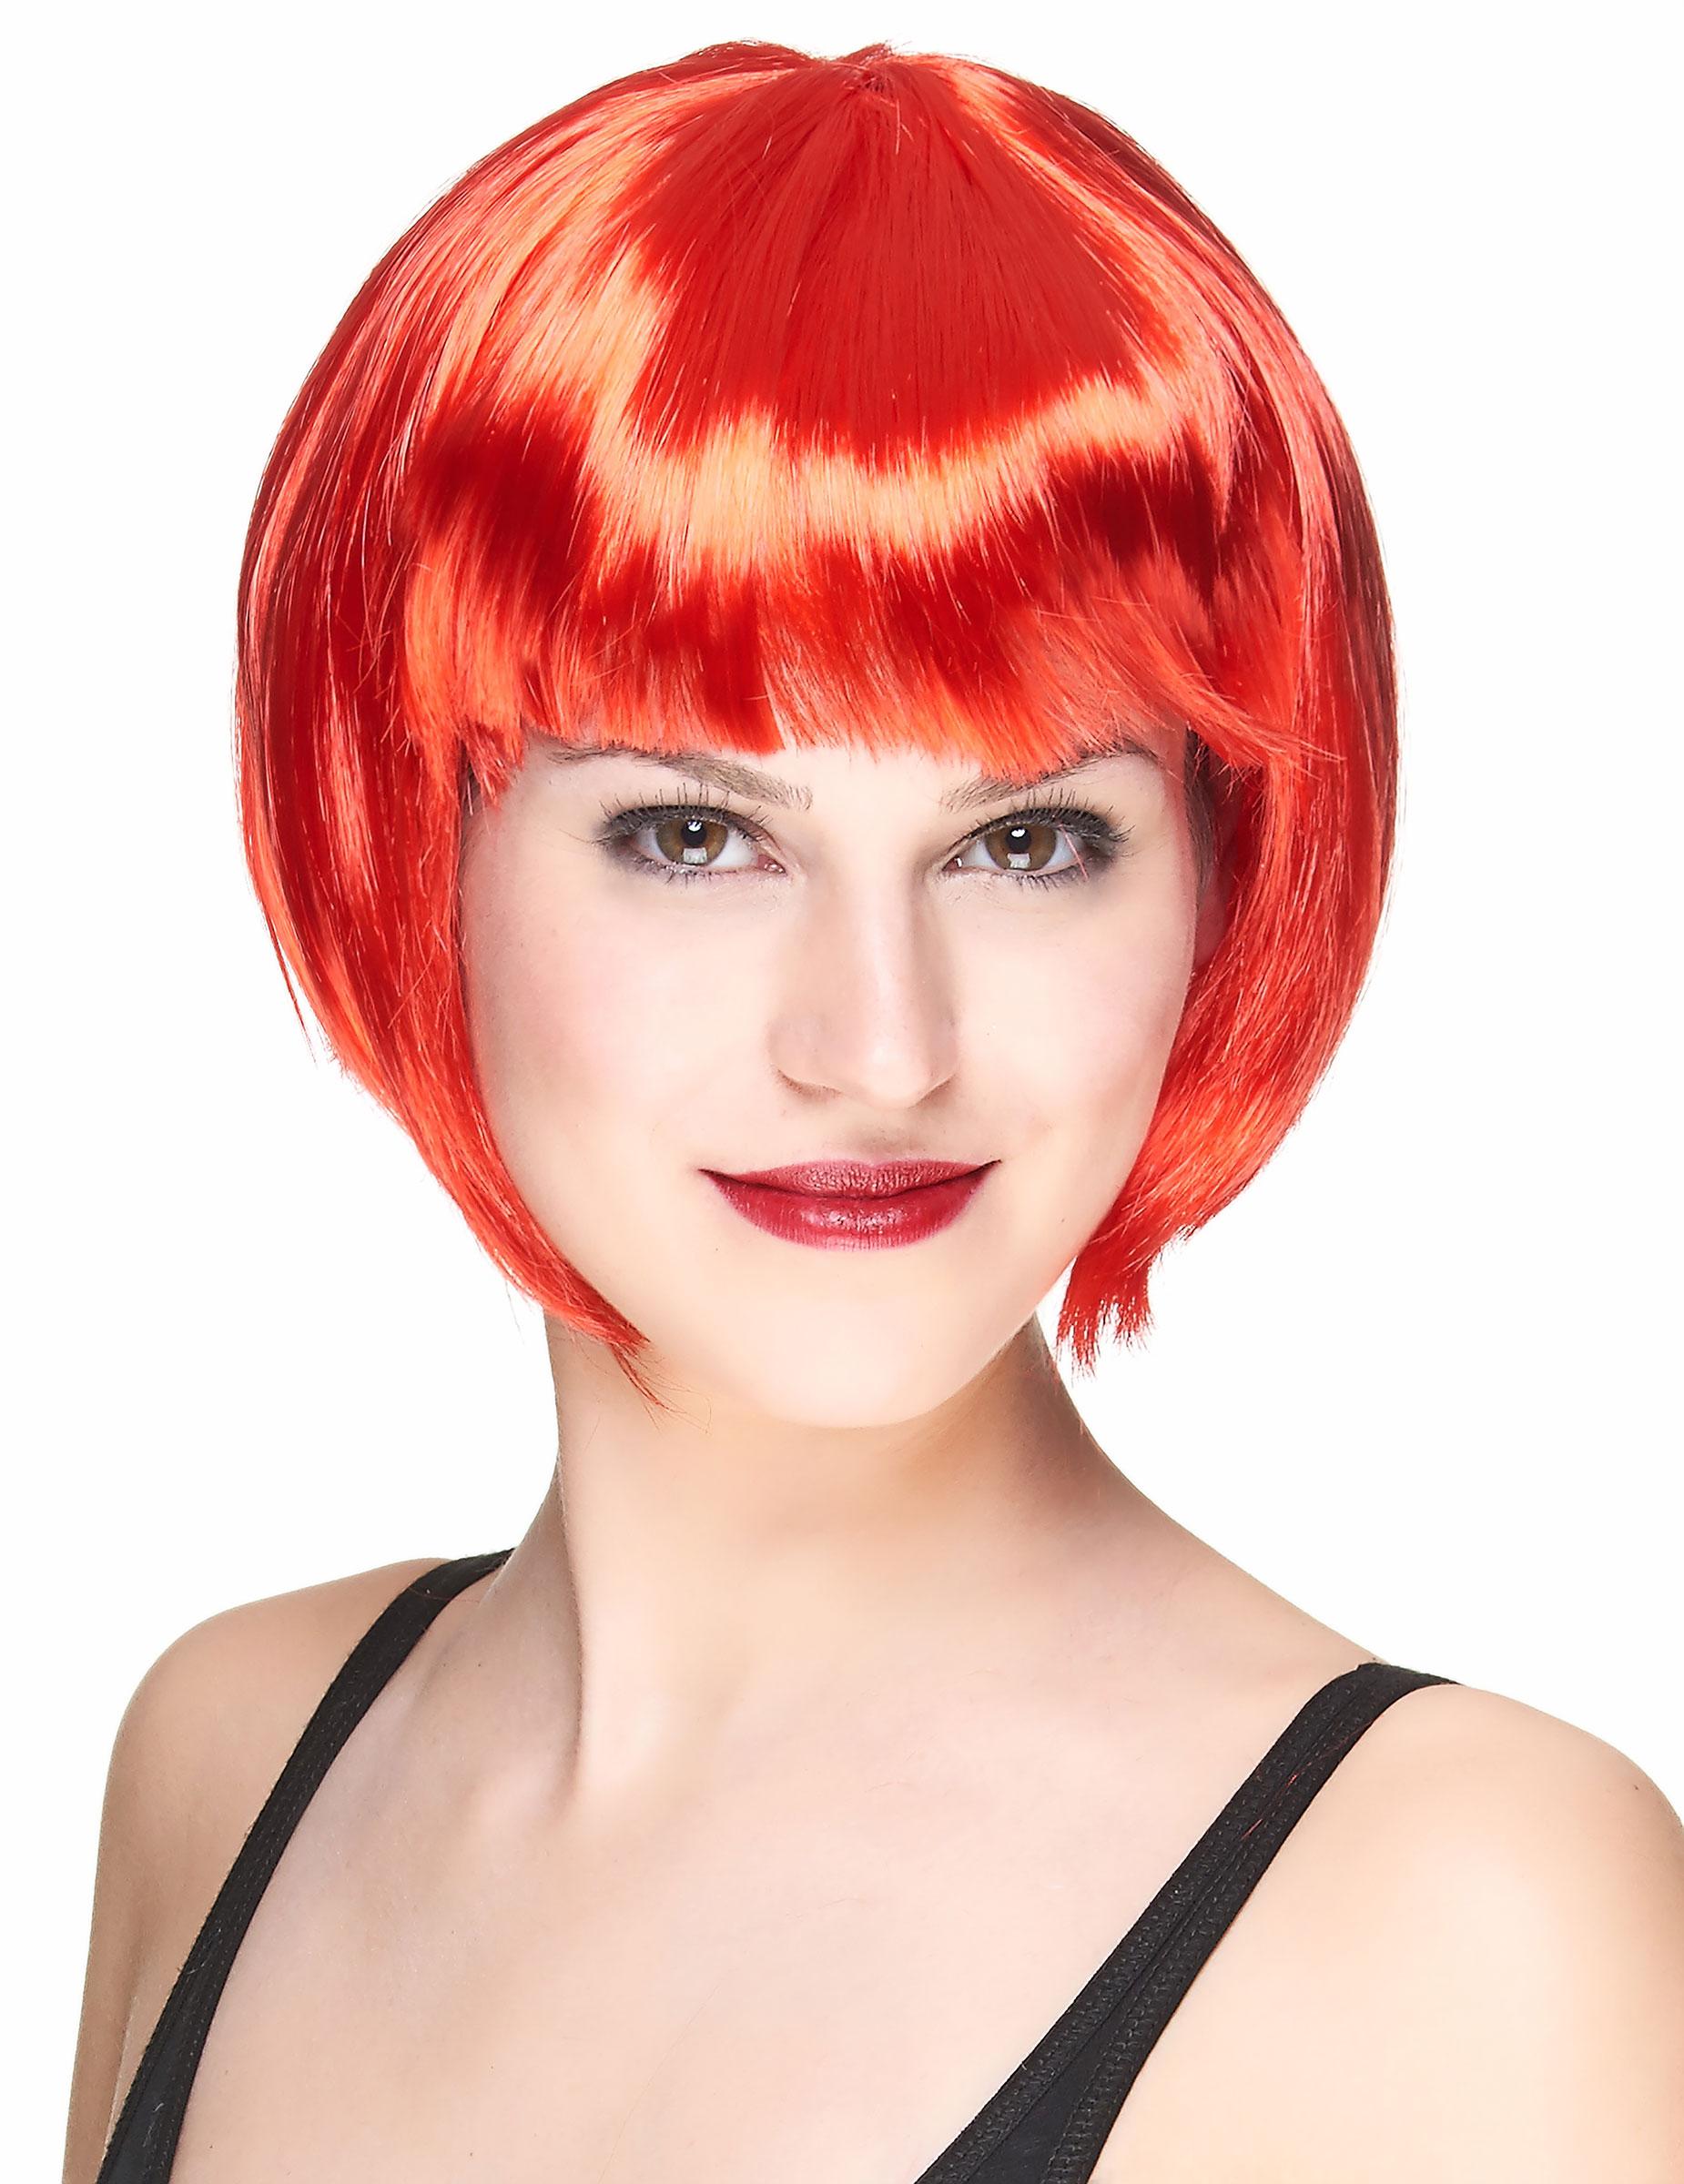 Perruque courte rouge femme : Deguise-toi,